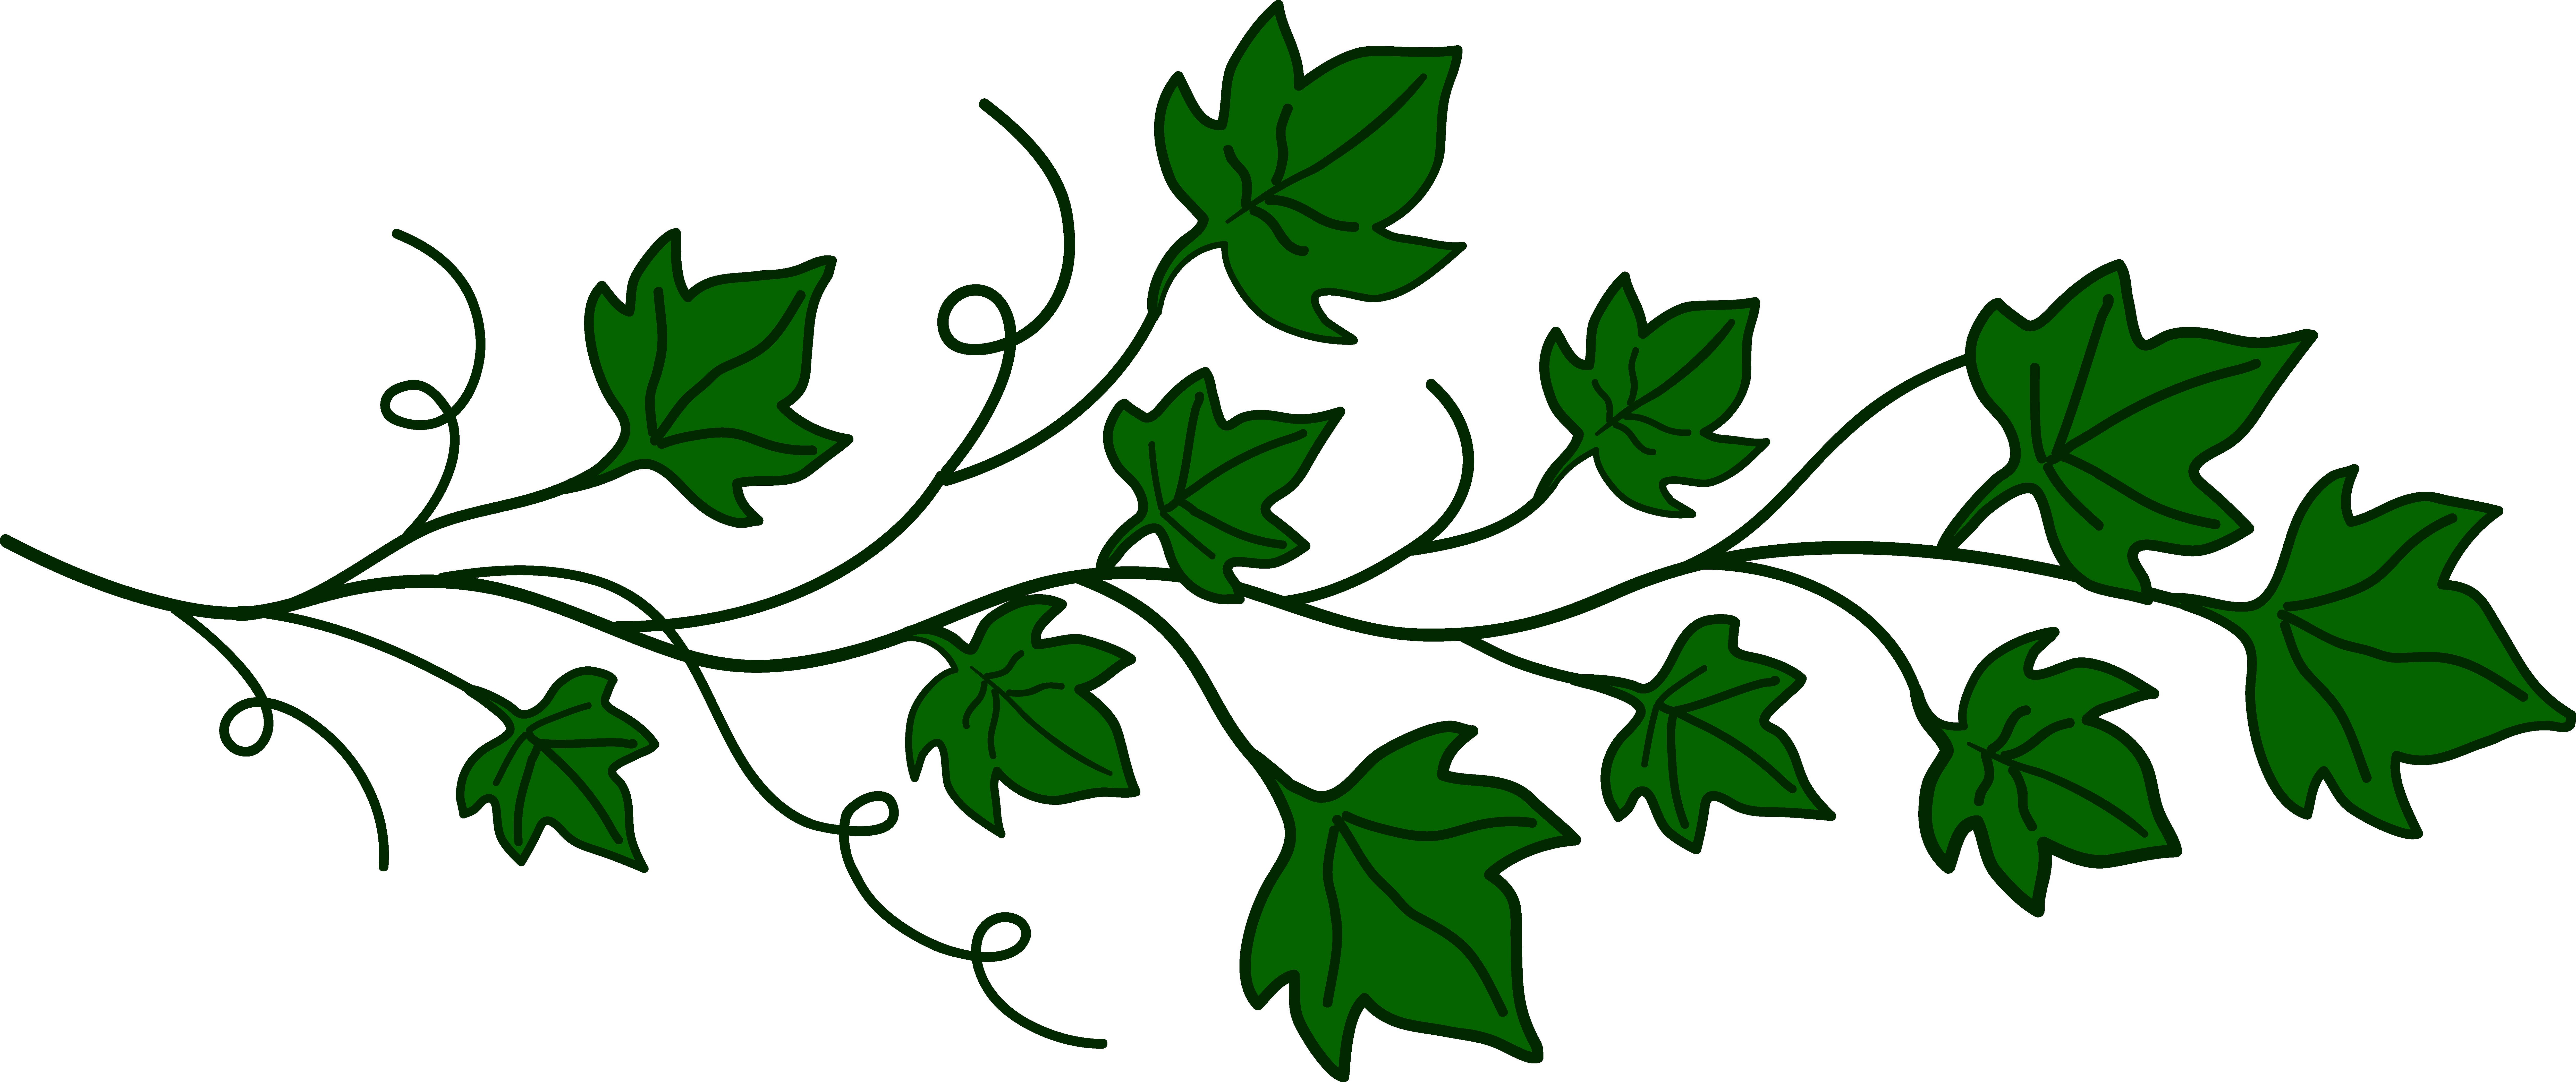 Grape Vine Clip Art U0026middot; Leaves -Grape Vine Clip Art u0026middot; Leaves Cartoon-1